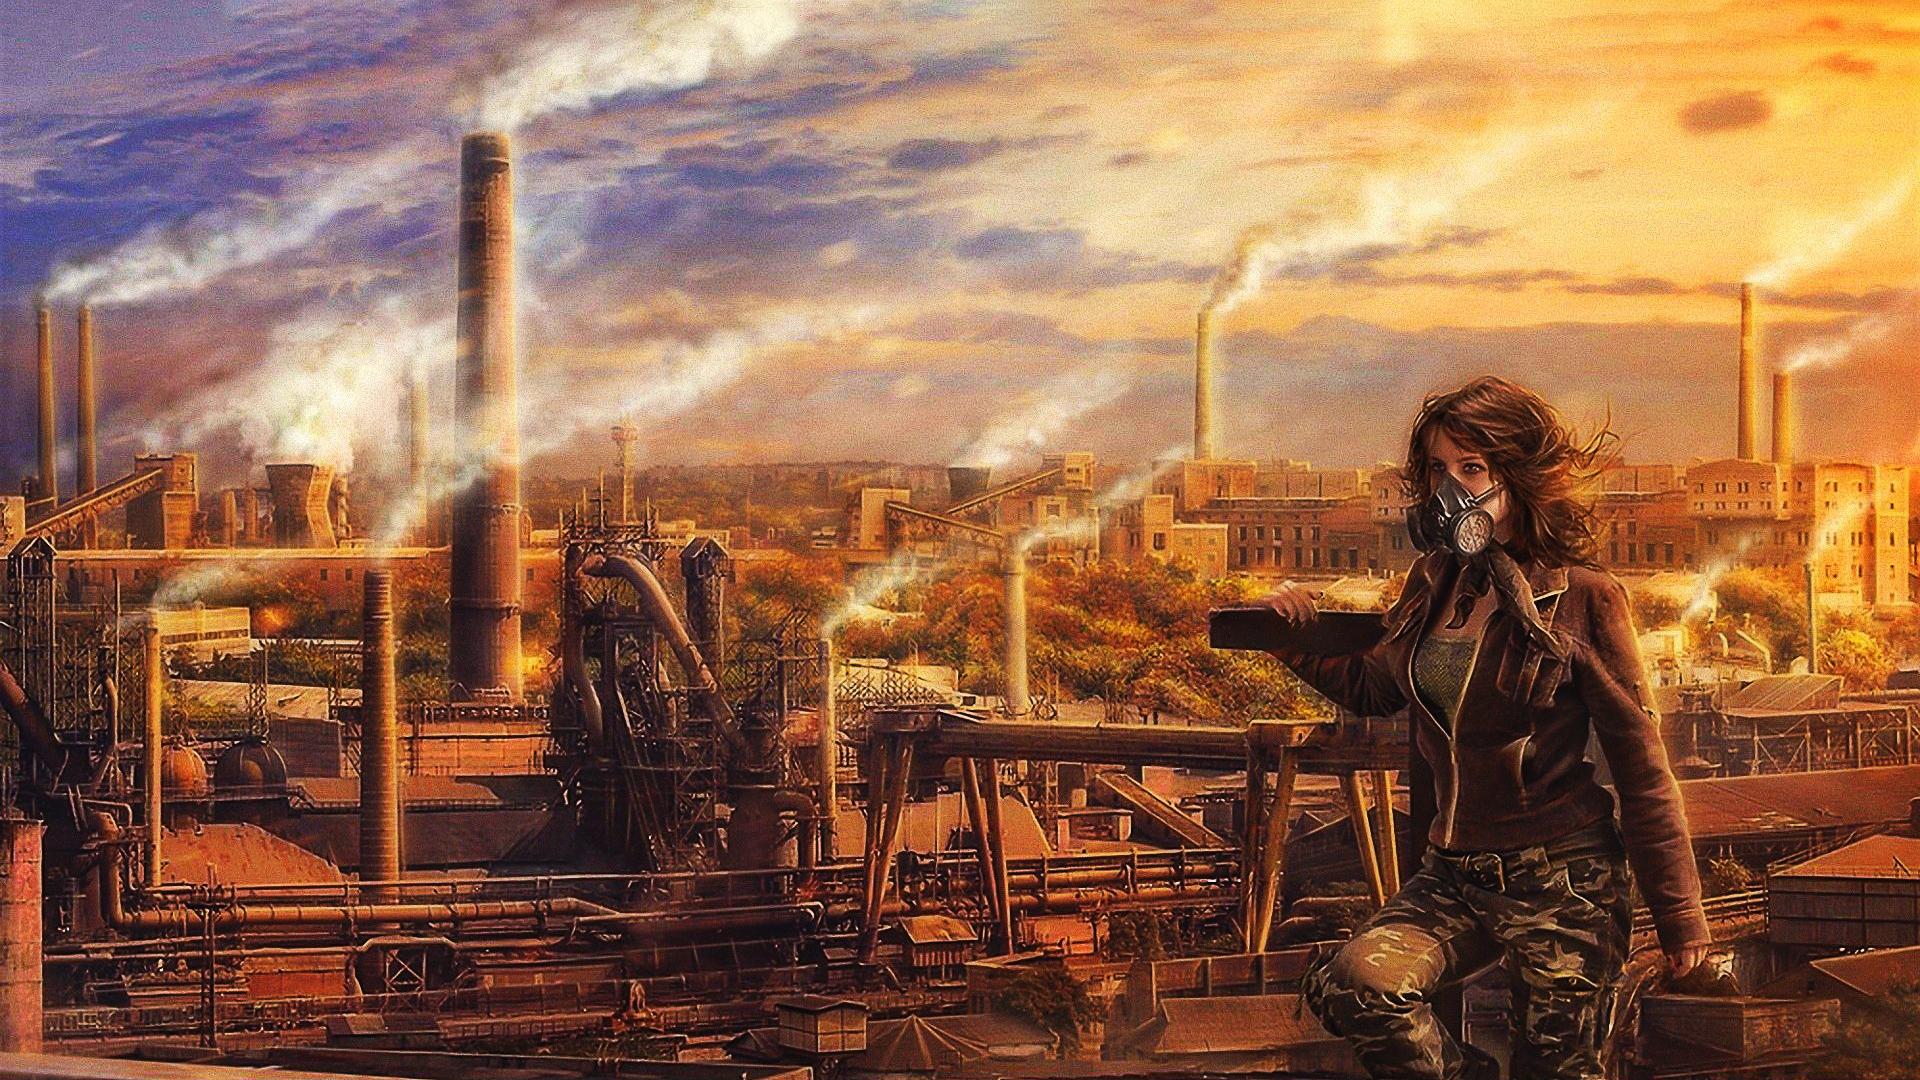 General 1920x1080 gas masks apocalyptic women artwork pollution industrial sky